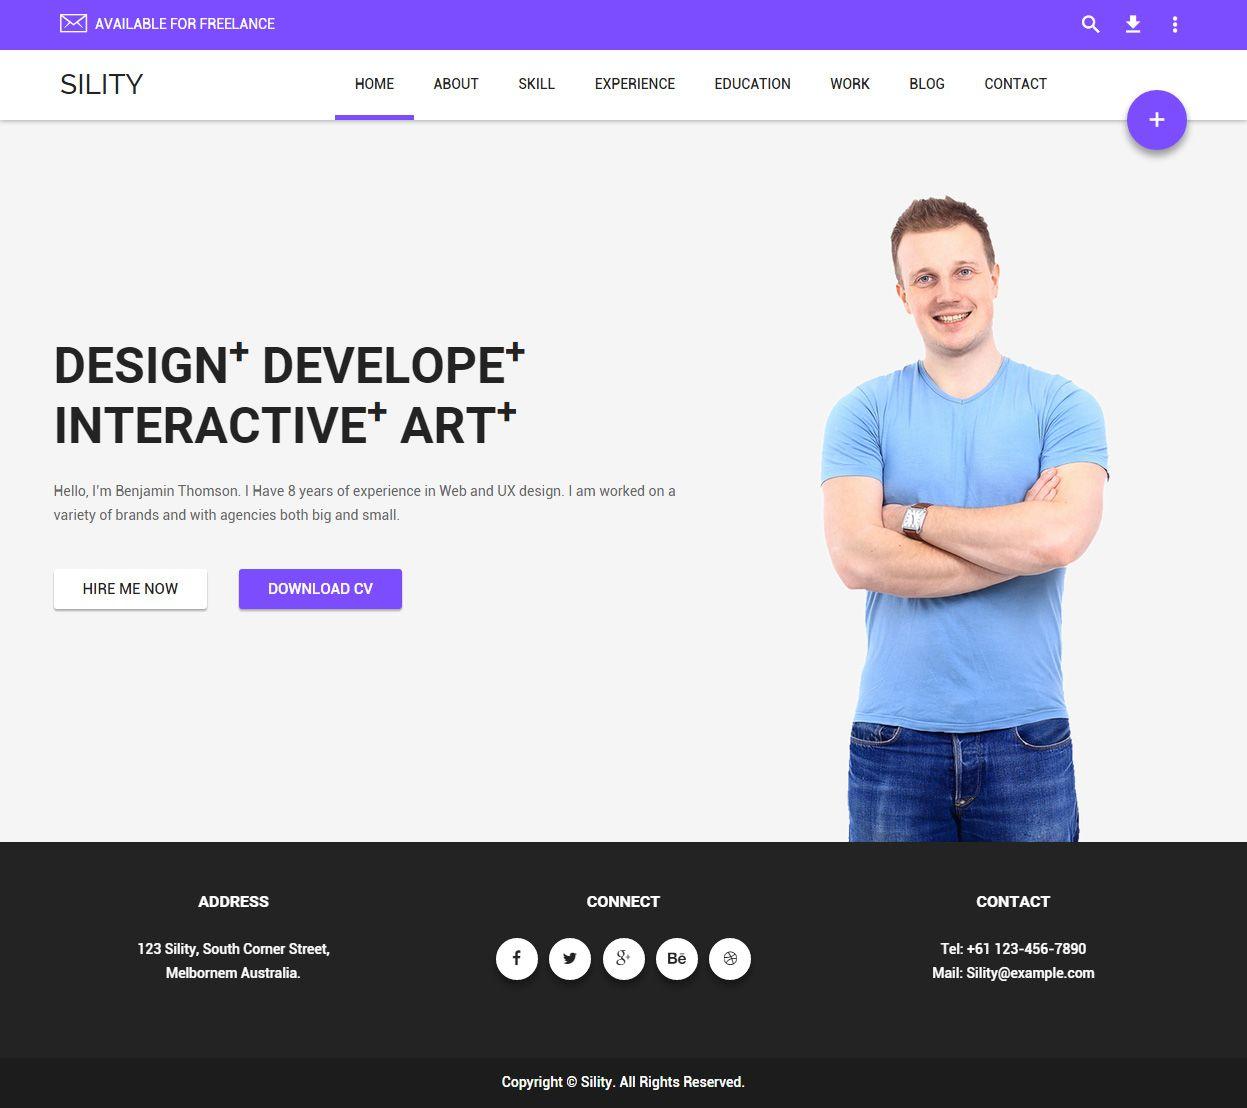 Sility - Premium Responsive CV & Resume HTML5 Template